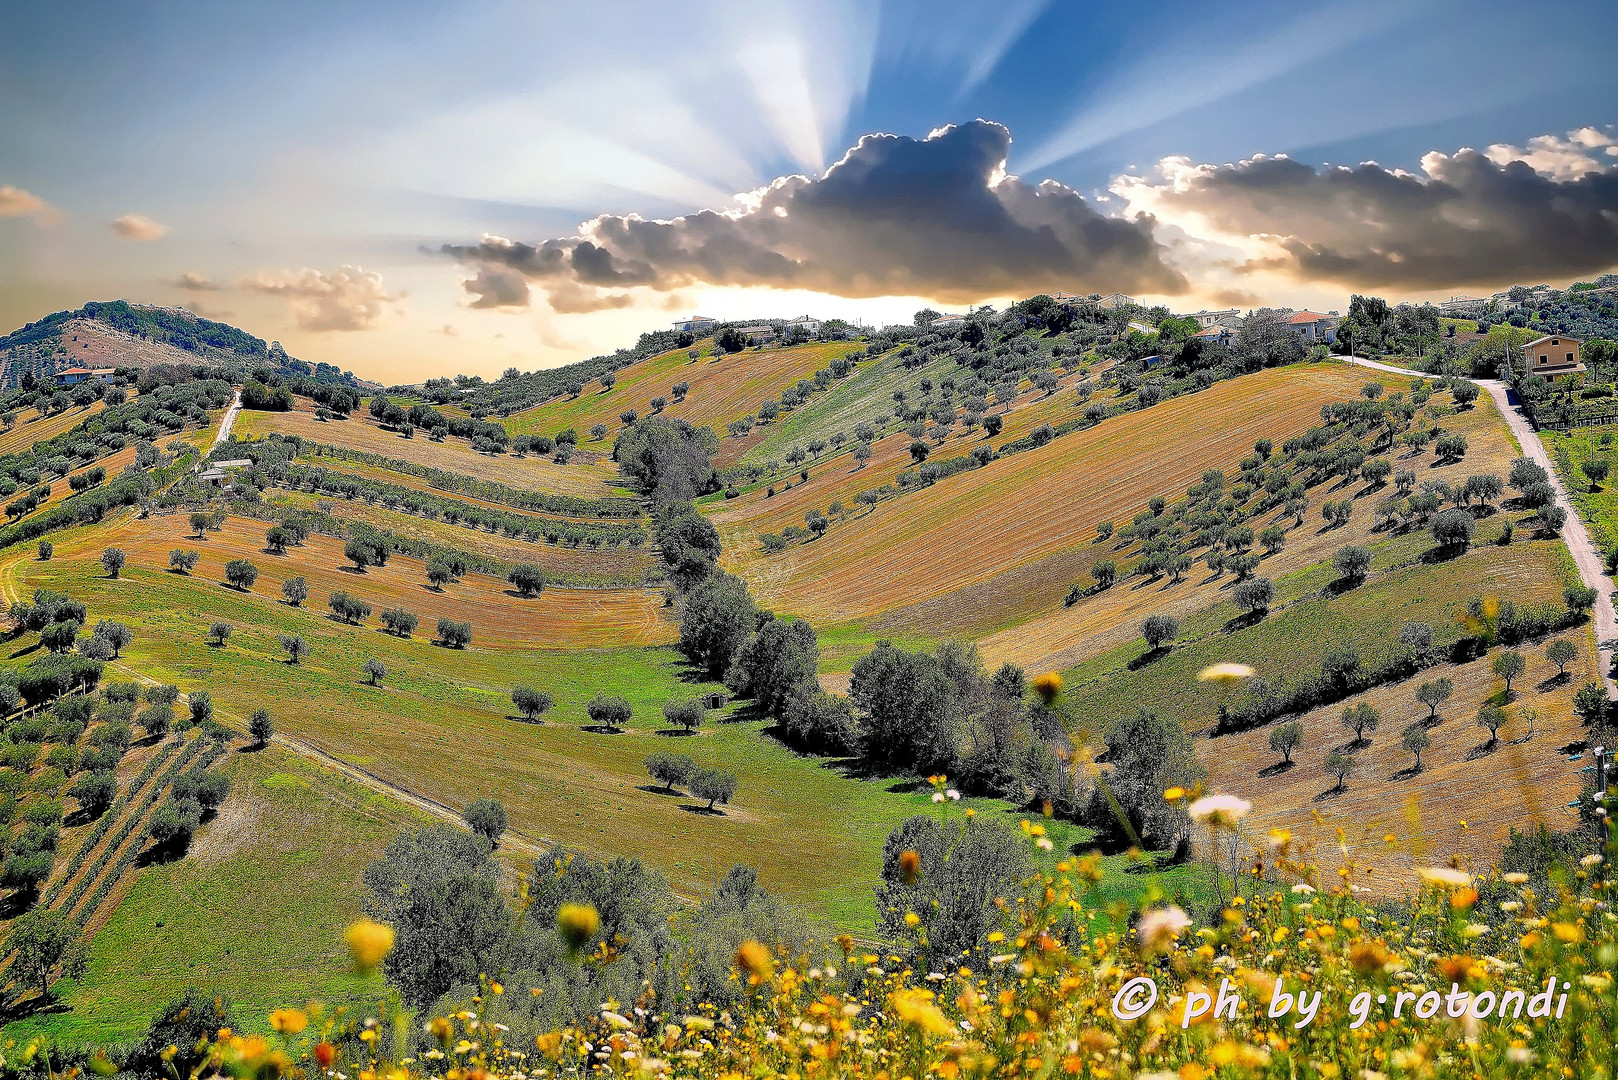 Val Vibrata (AP) Italy